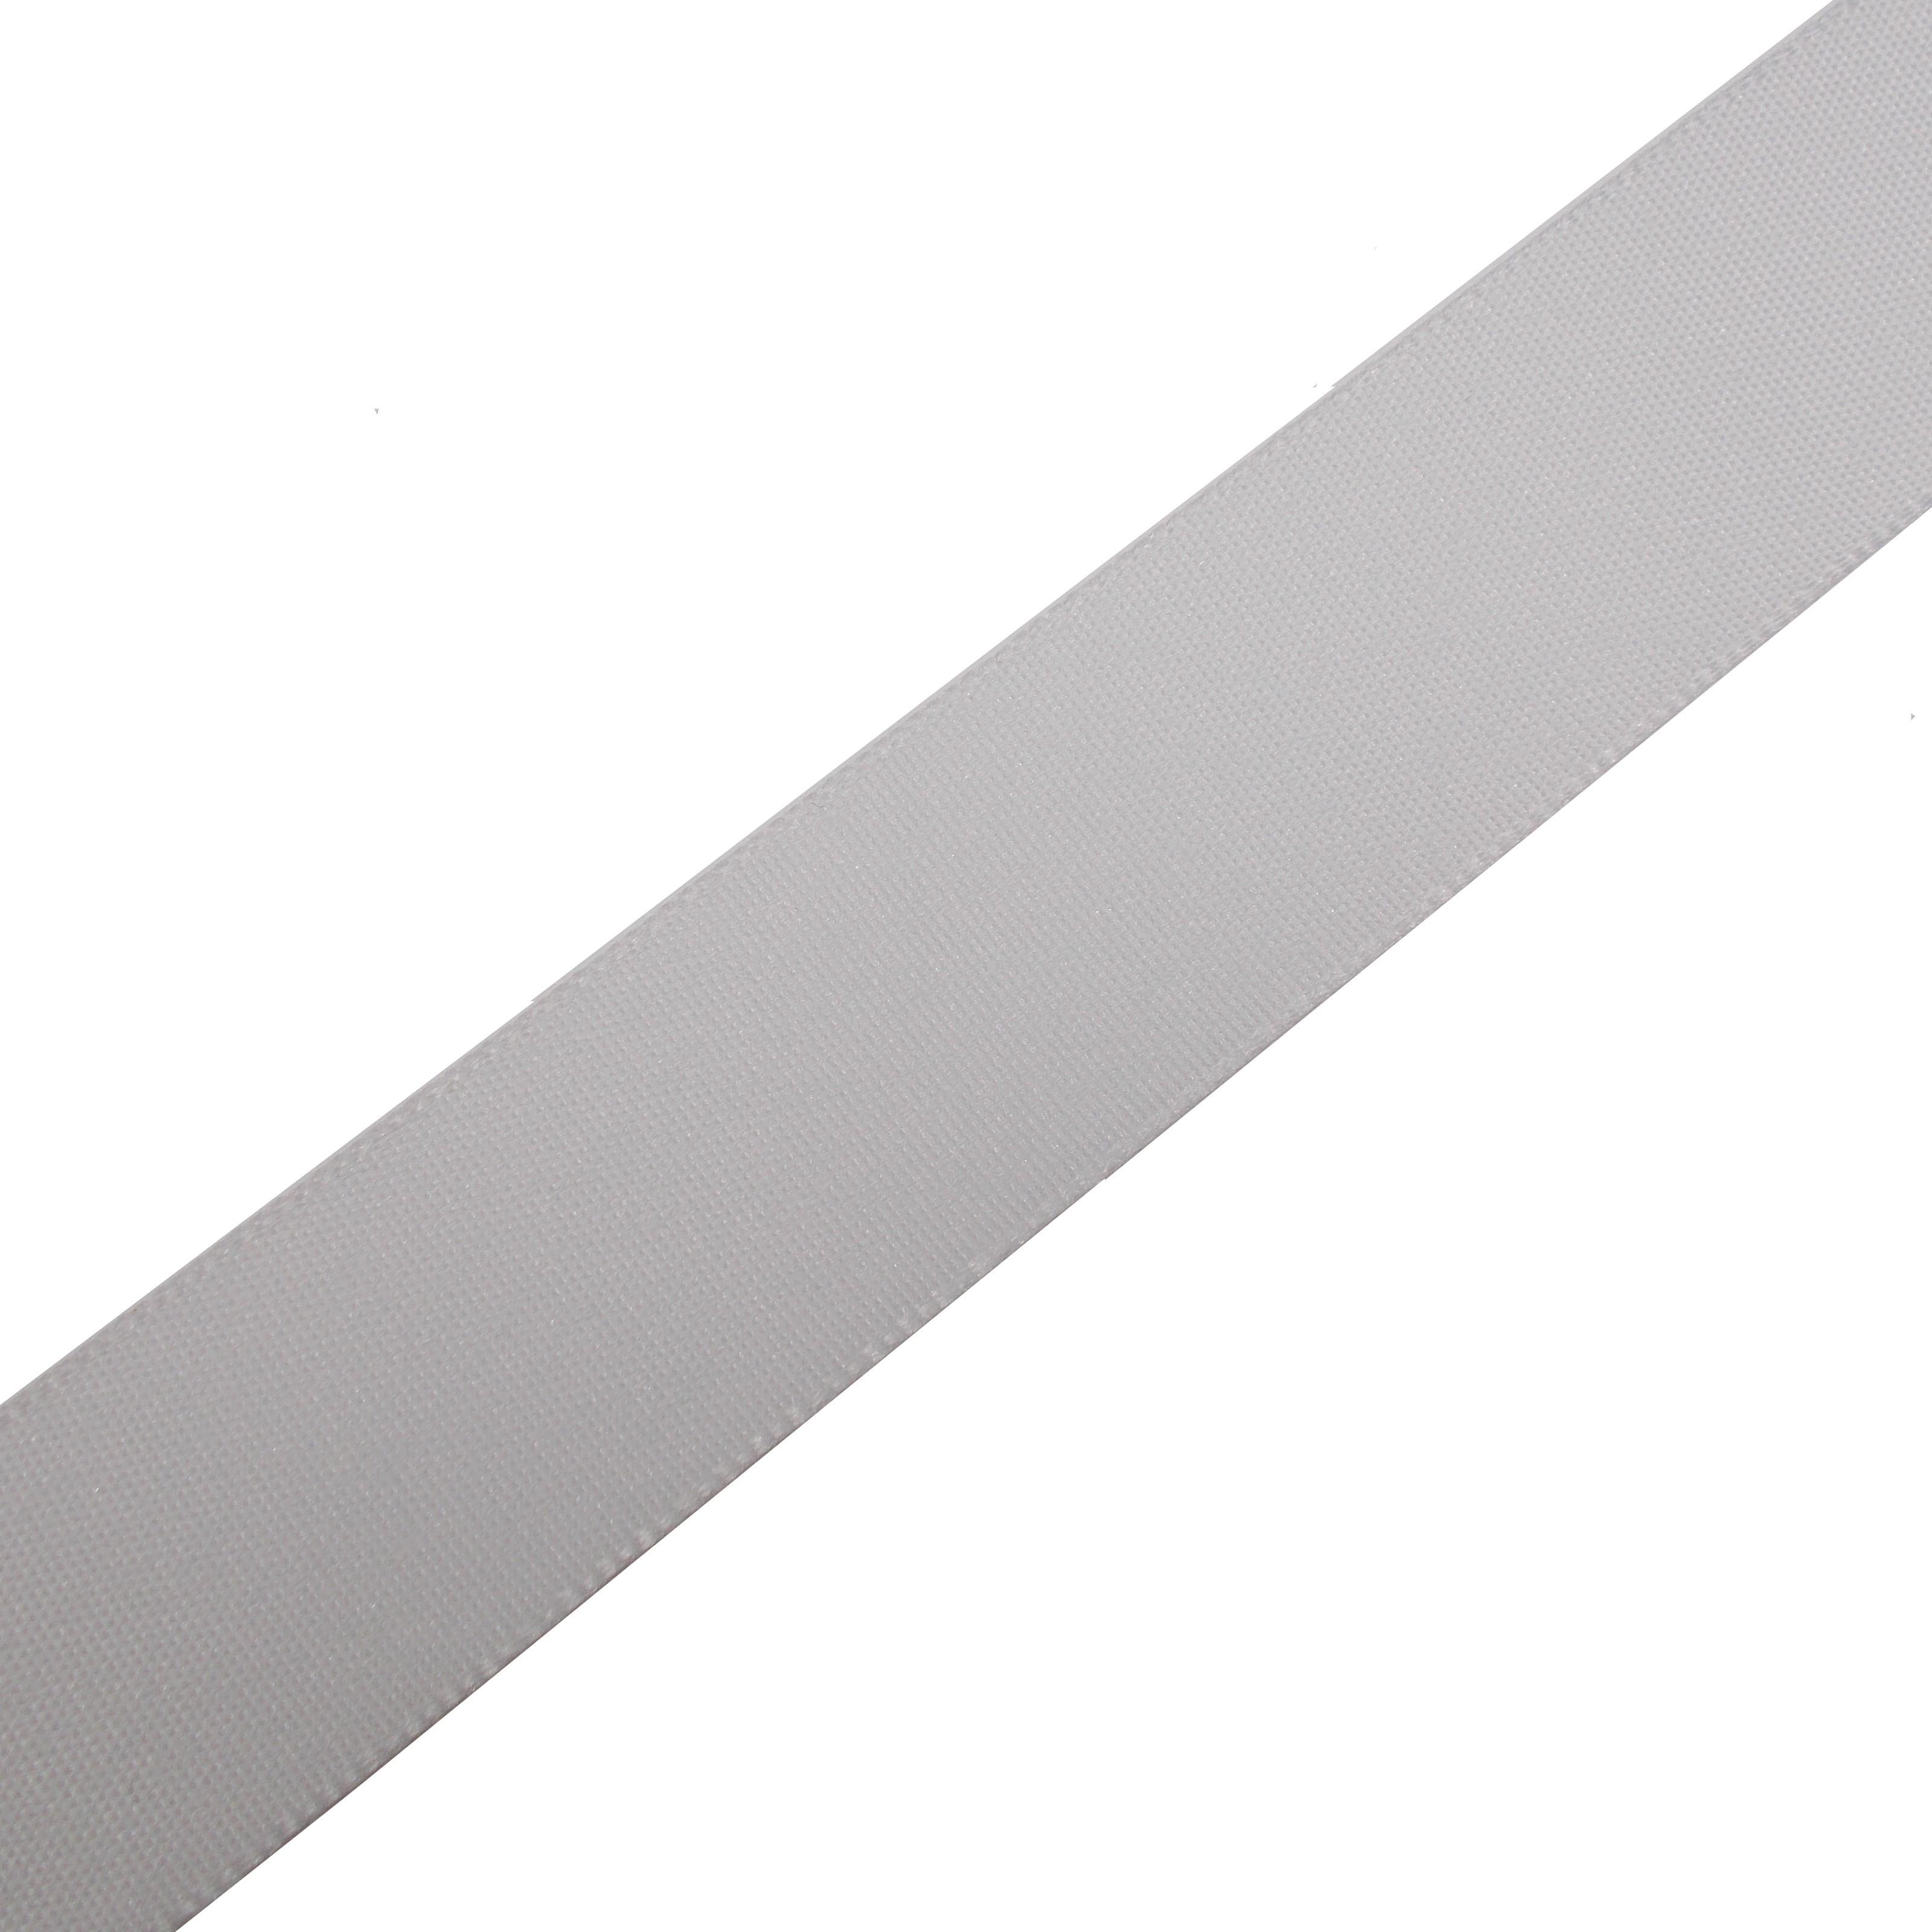 Berisfords Seam Binding Polyester Ribbon Tape 12mm wide White 3 metre length